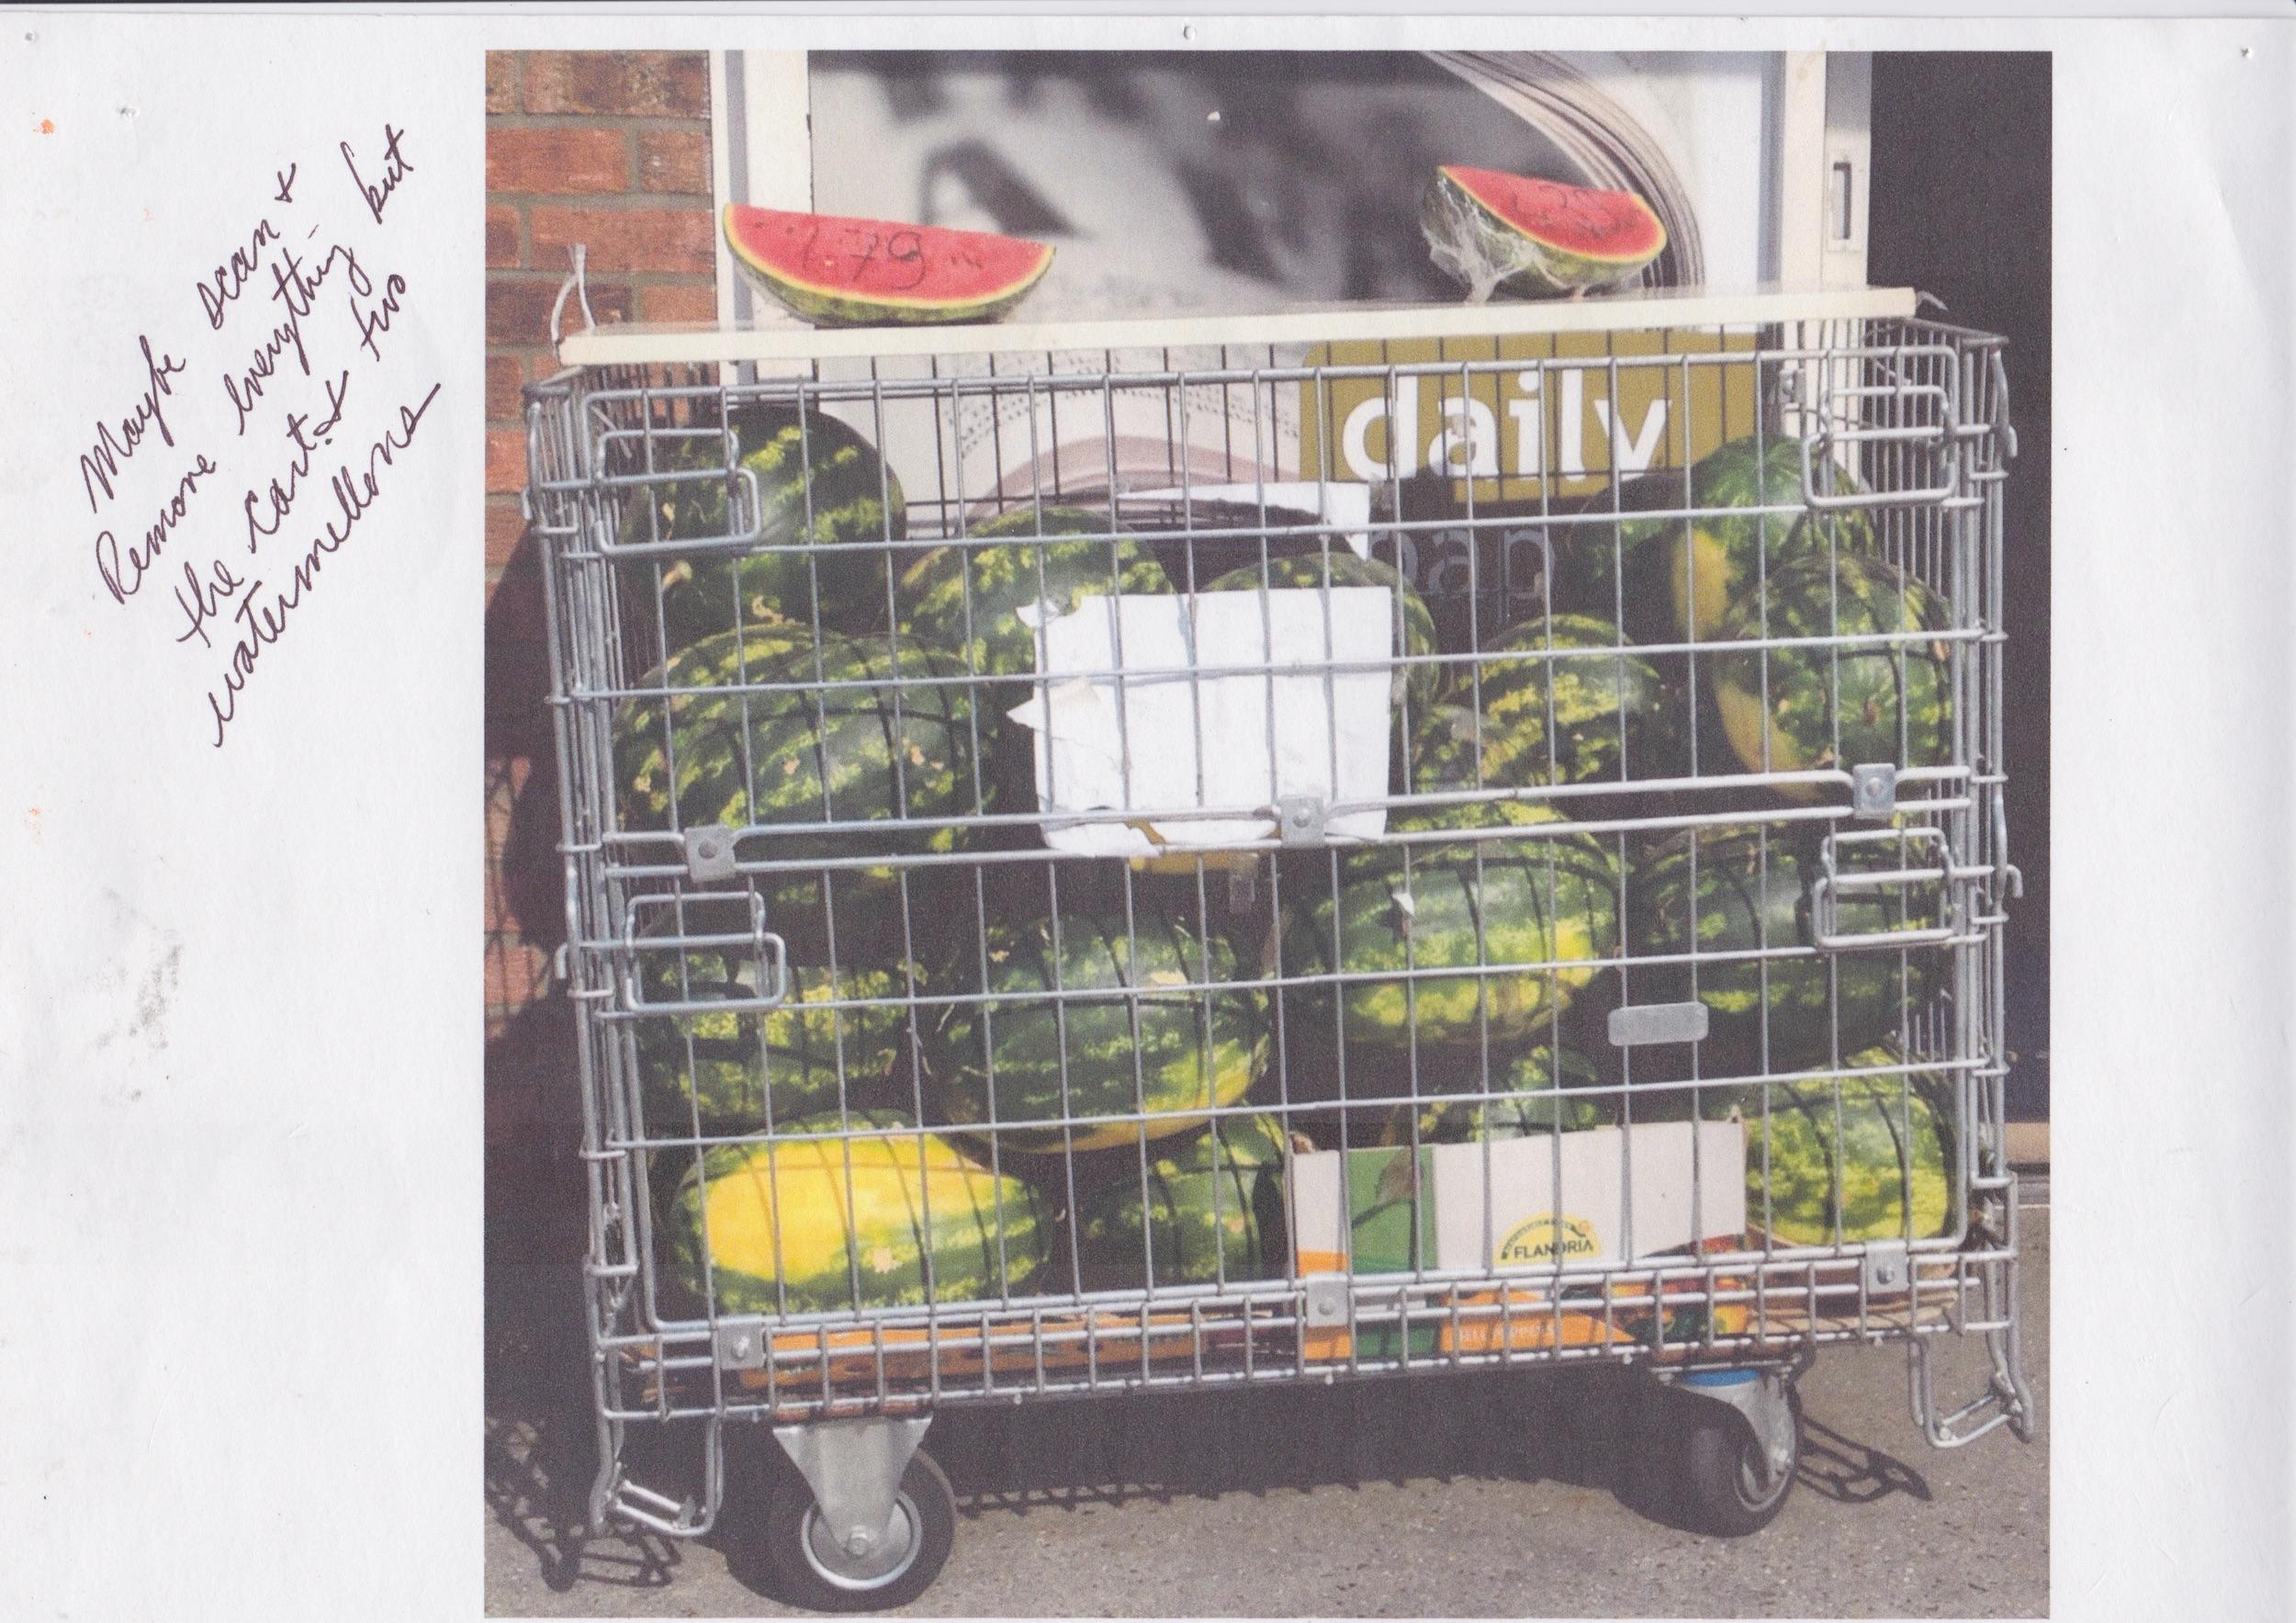 Watermelons in London Printed 2014 Scanned 2017